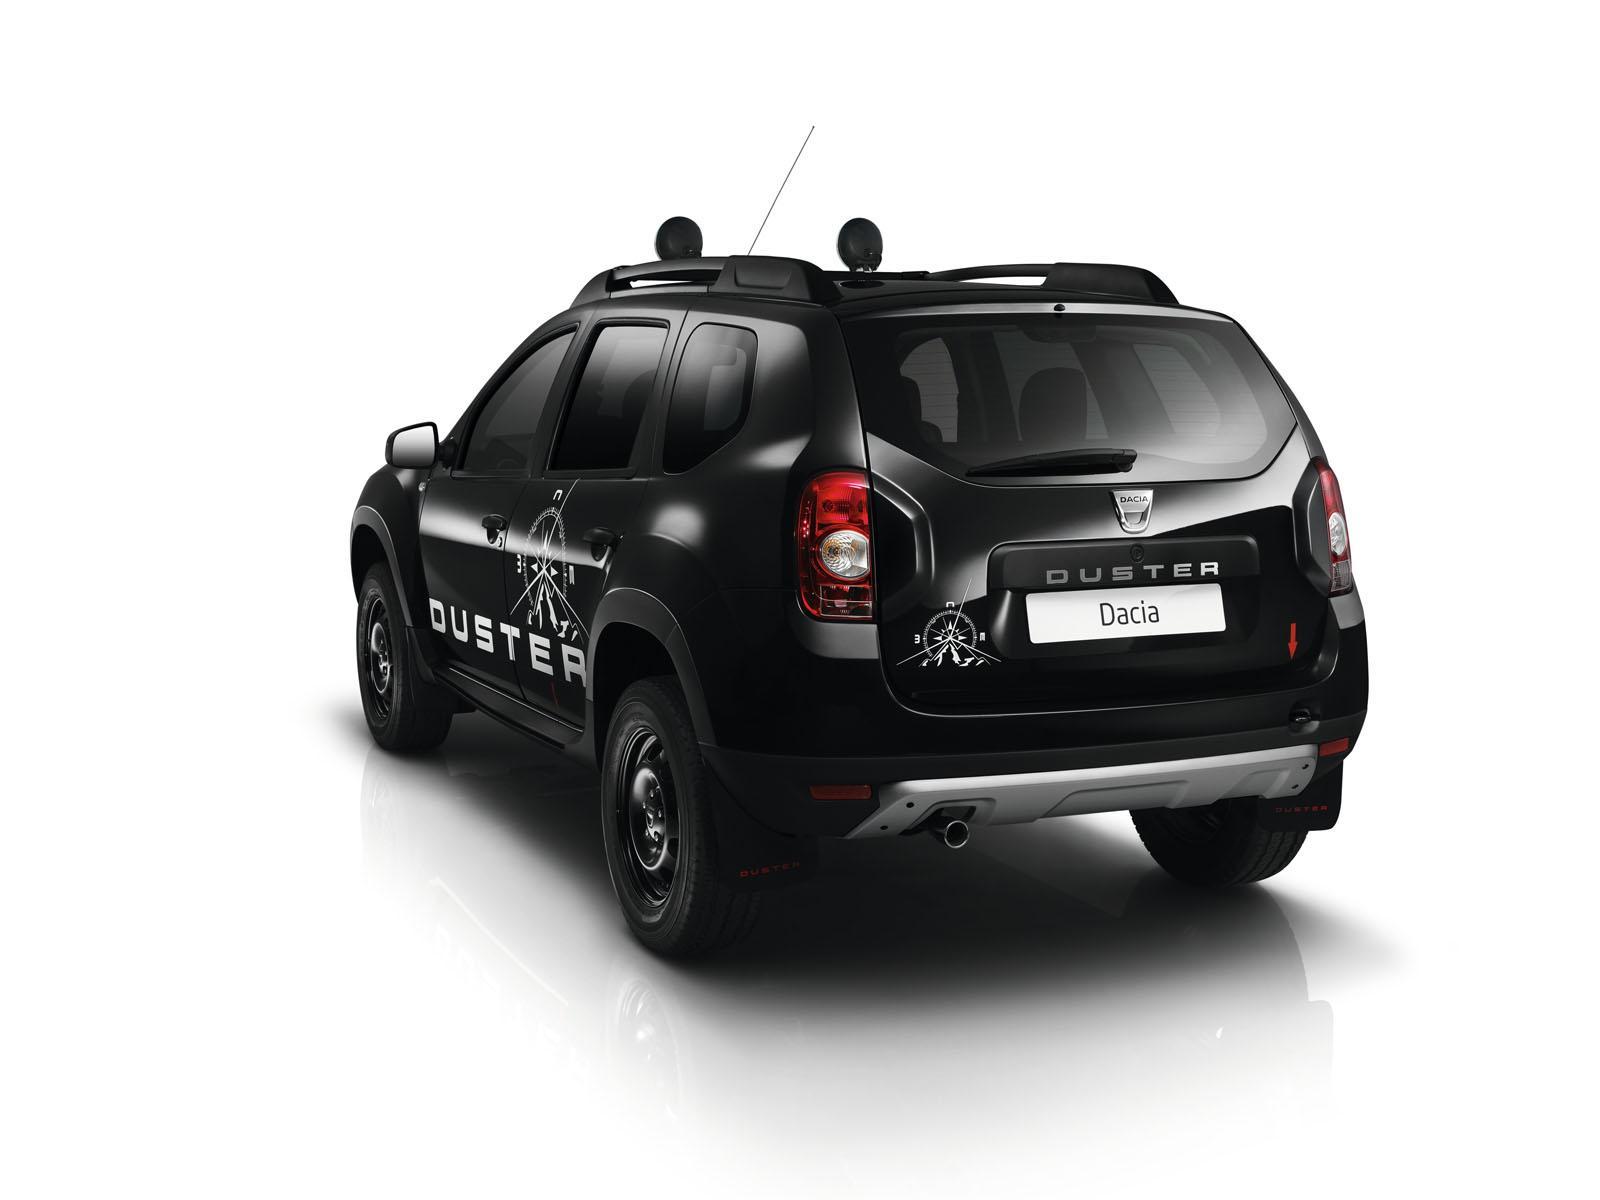 2013 Geneva Motor Show Dacia Duster Adventure Edition